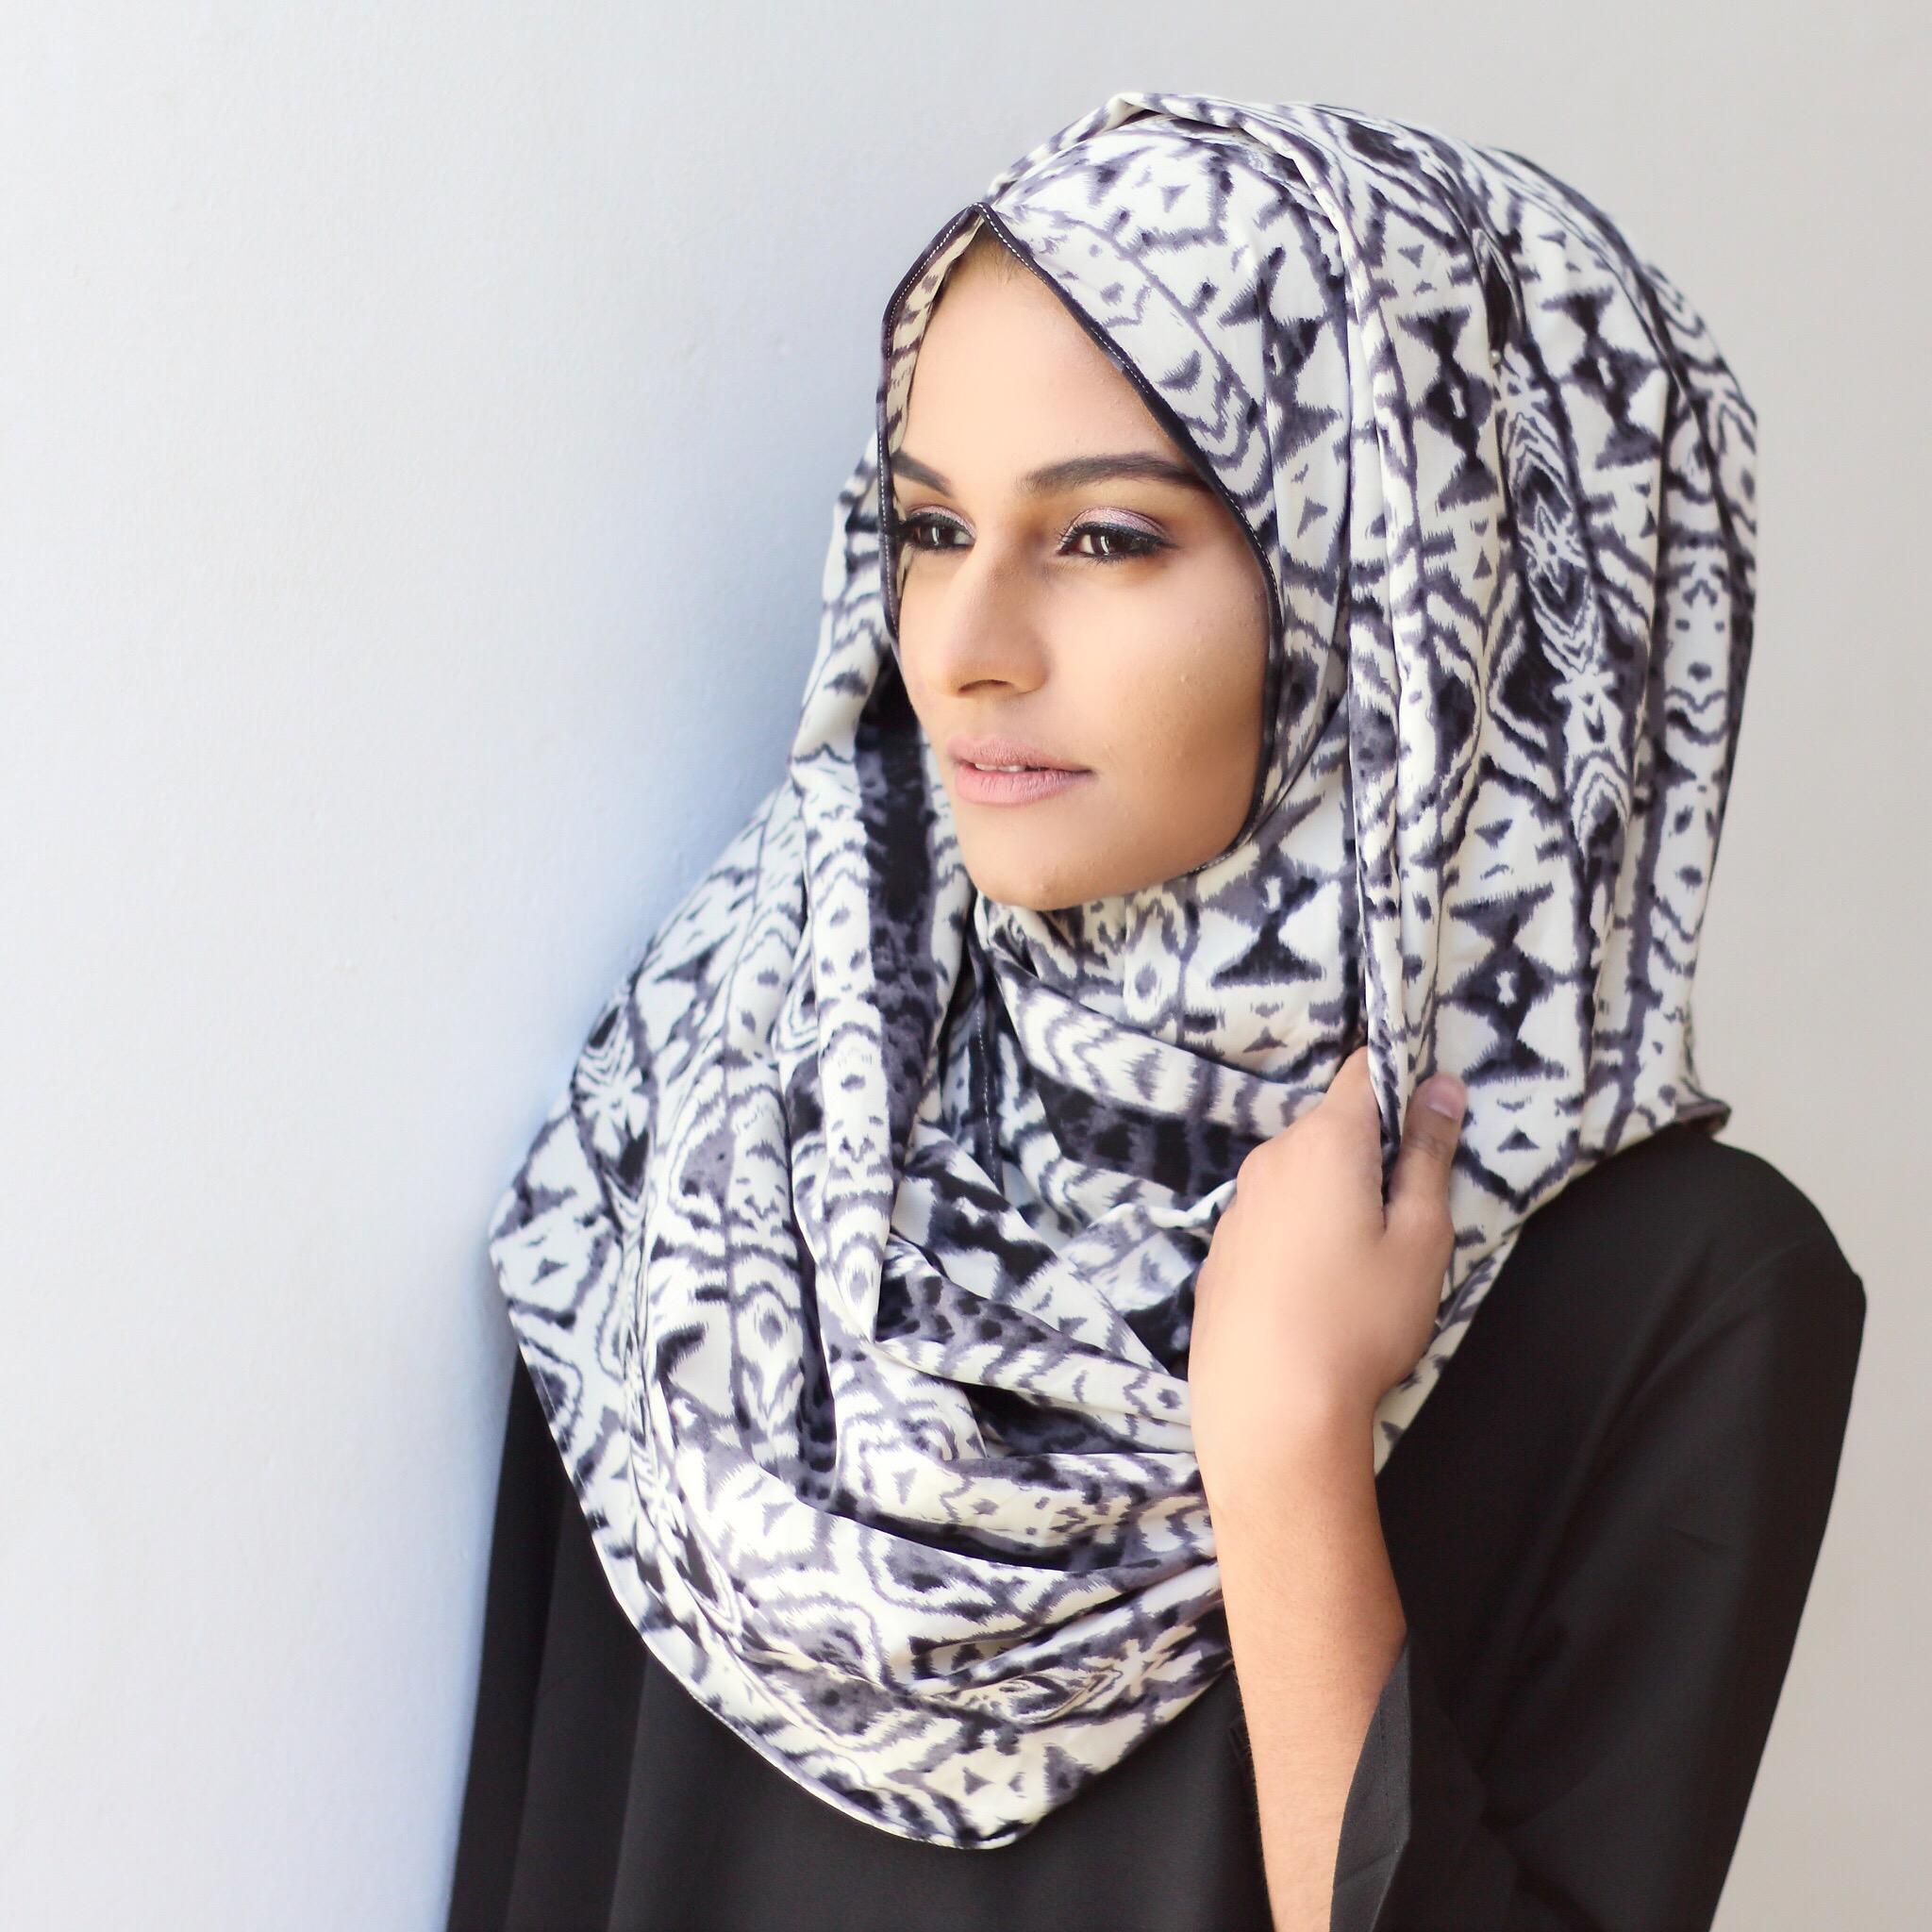 How to infinity wear scarf hijab video